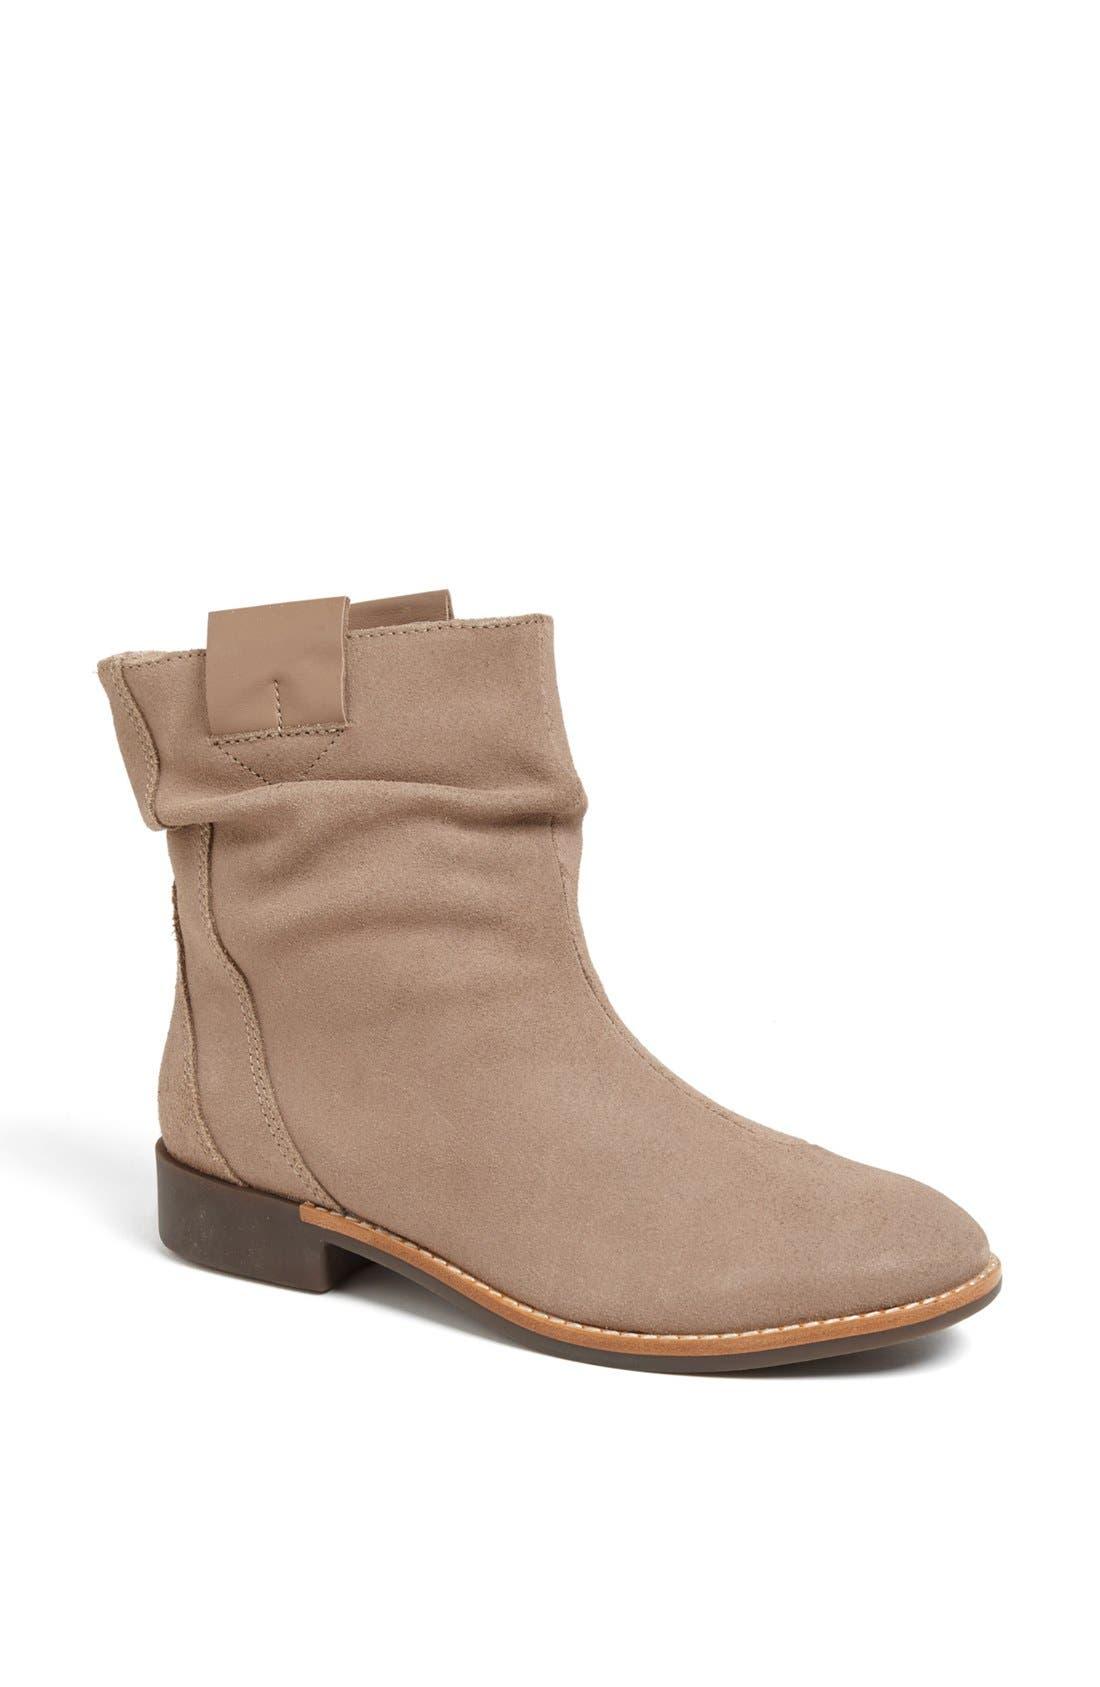 Alternate Image 1 Selected - Tsubo 'Leonie' Boot